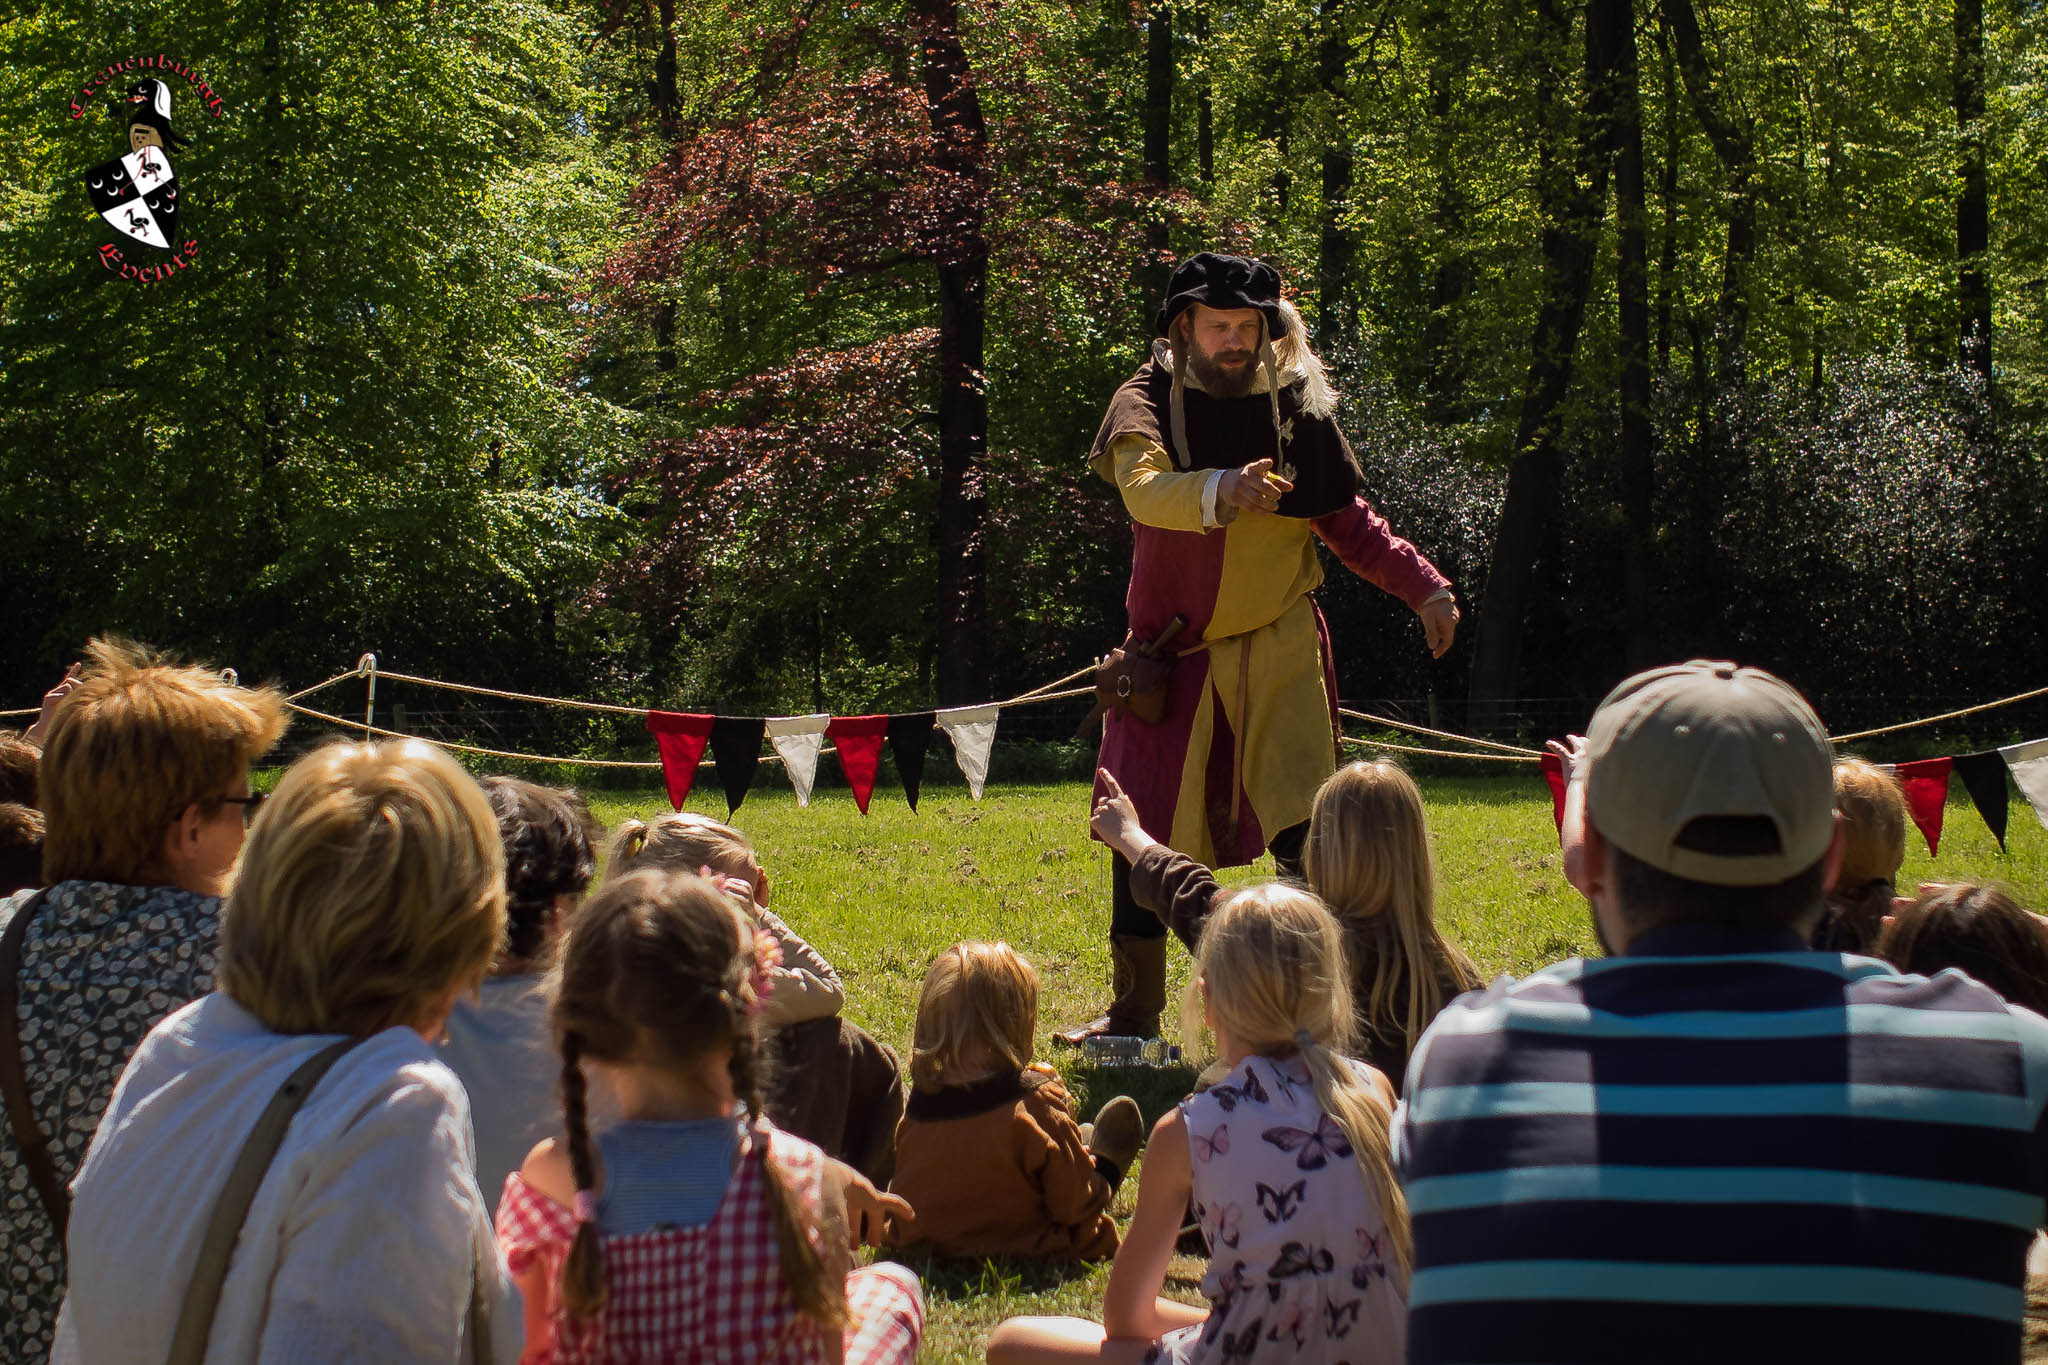 Middeleeuws-Festijn-Cannenburgh-2018-Algemeen-Ellen-la-Faille-29